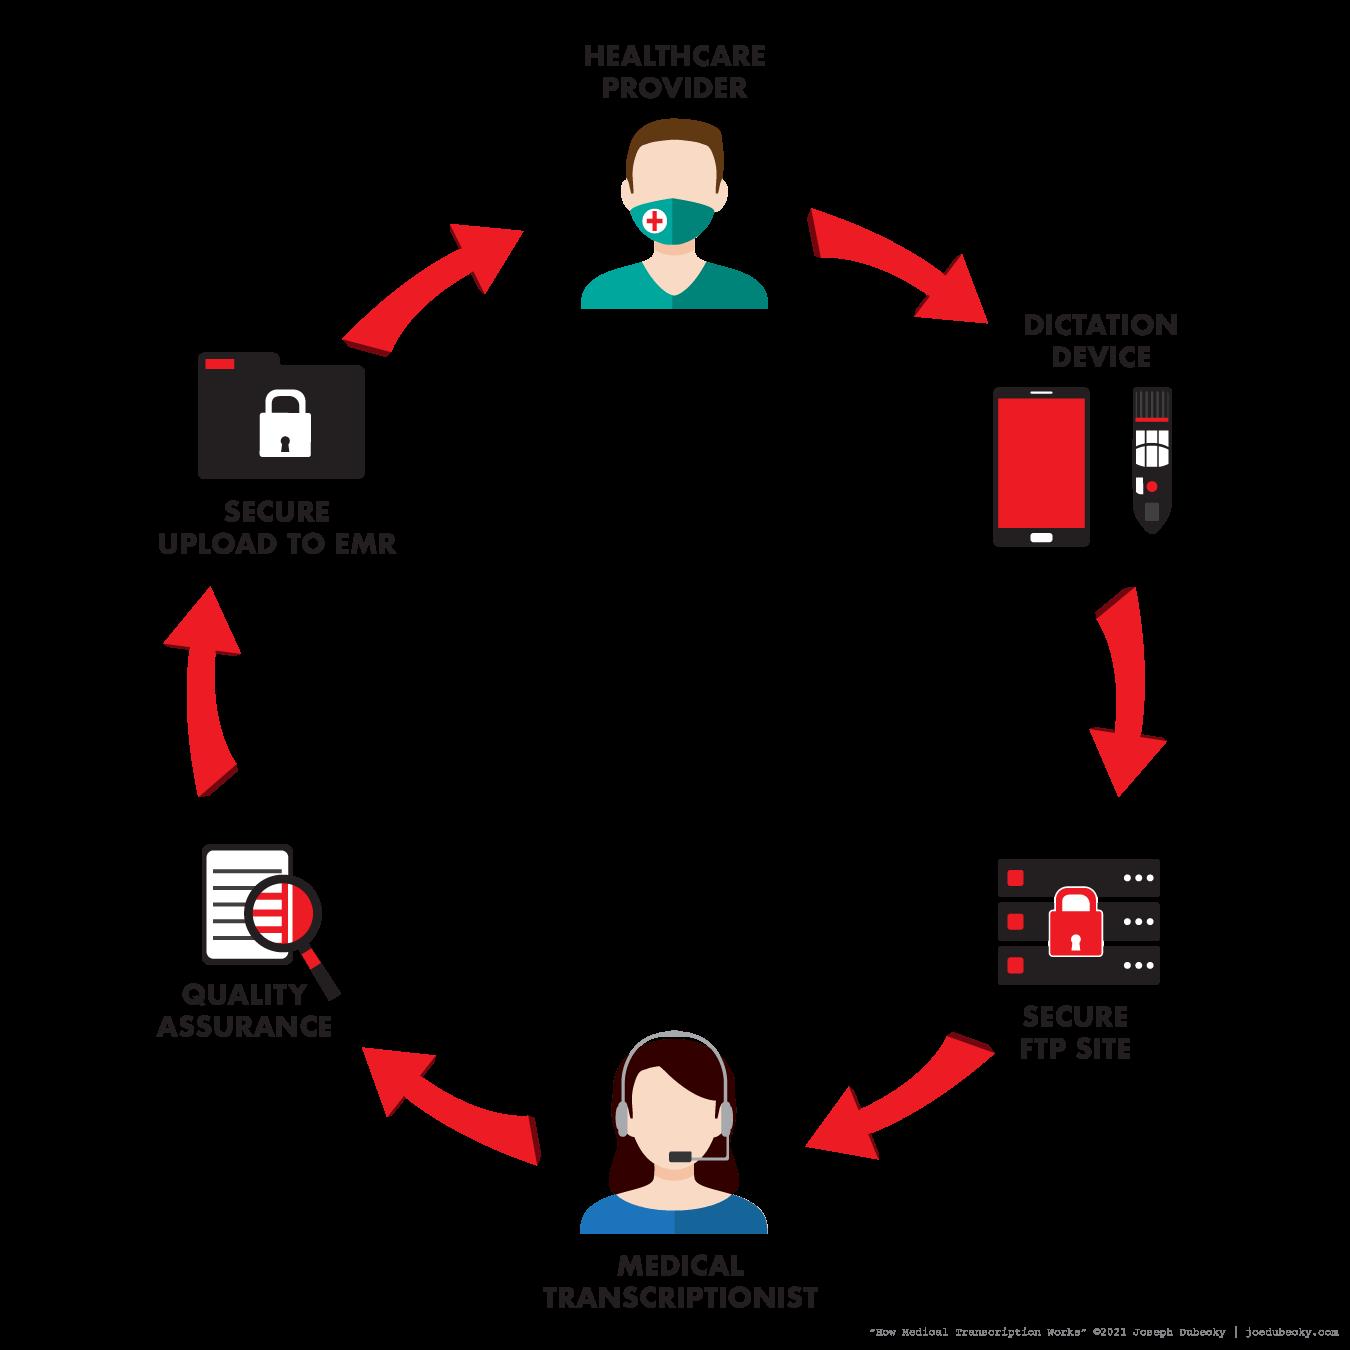 Medical Transcription workflow diagram